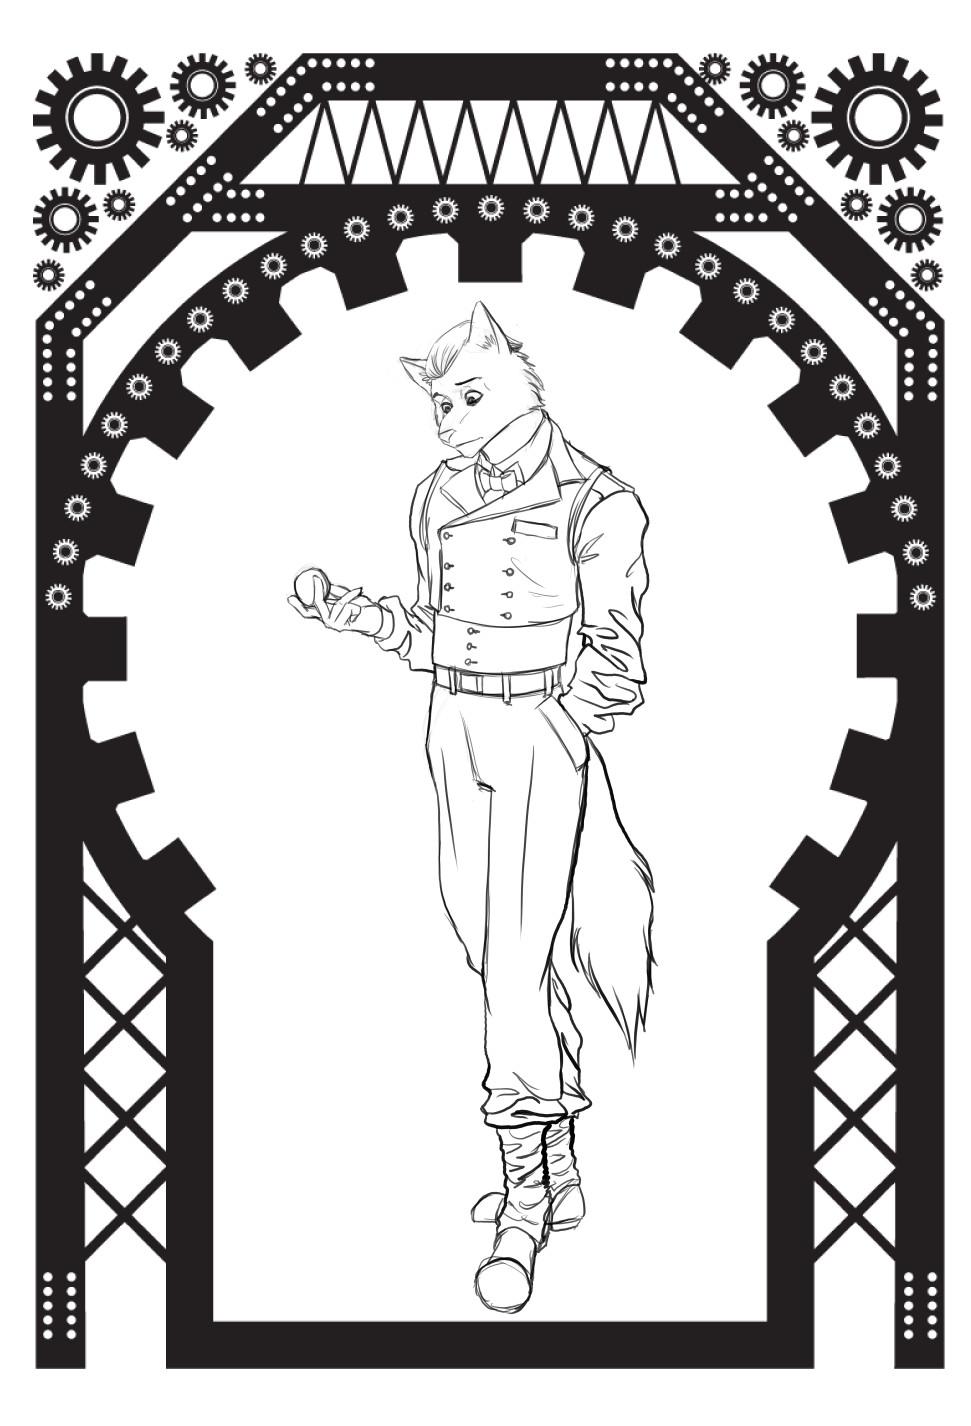 William calleja hans heinrich character design wip